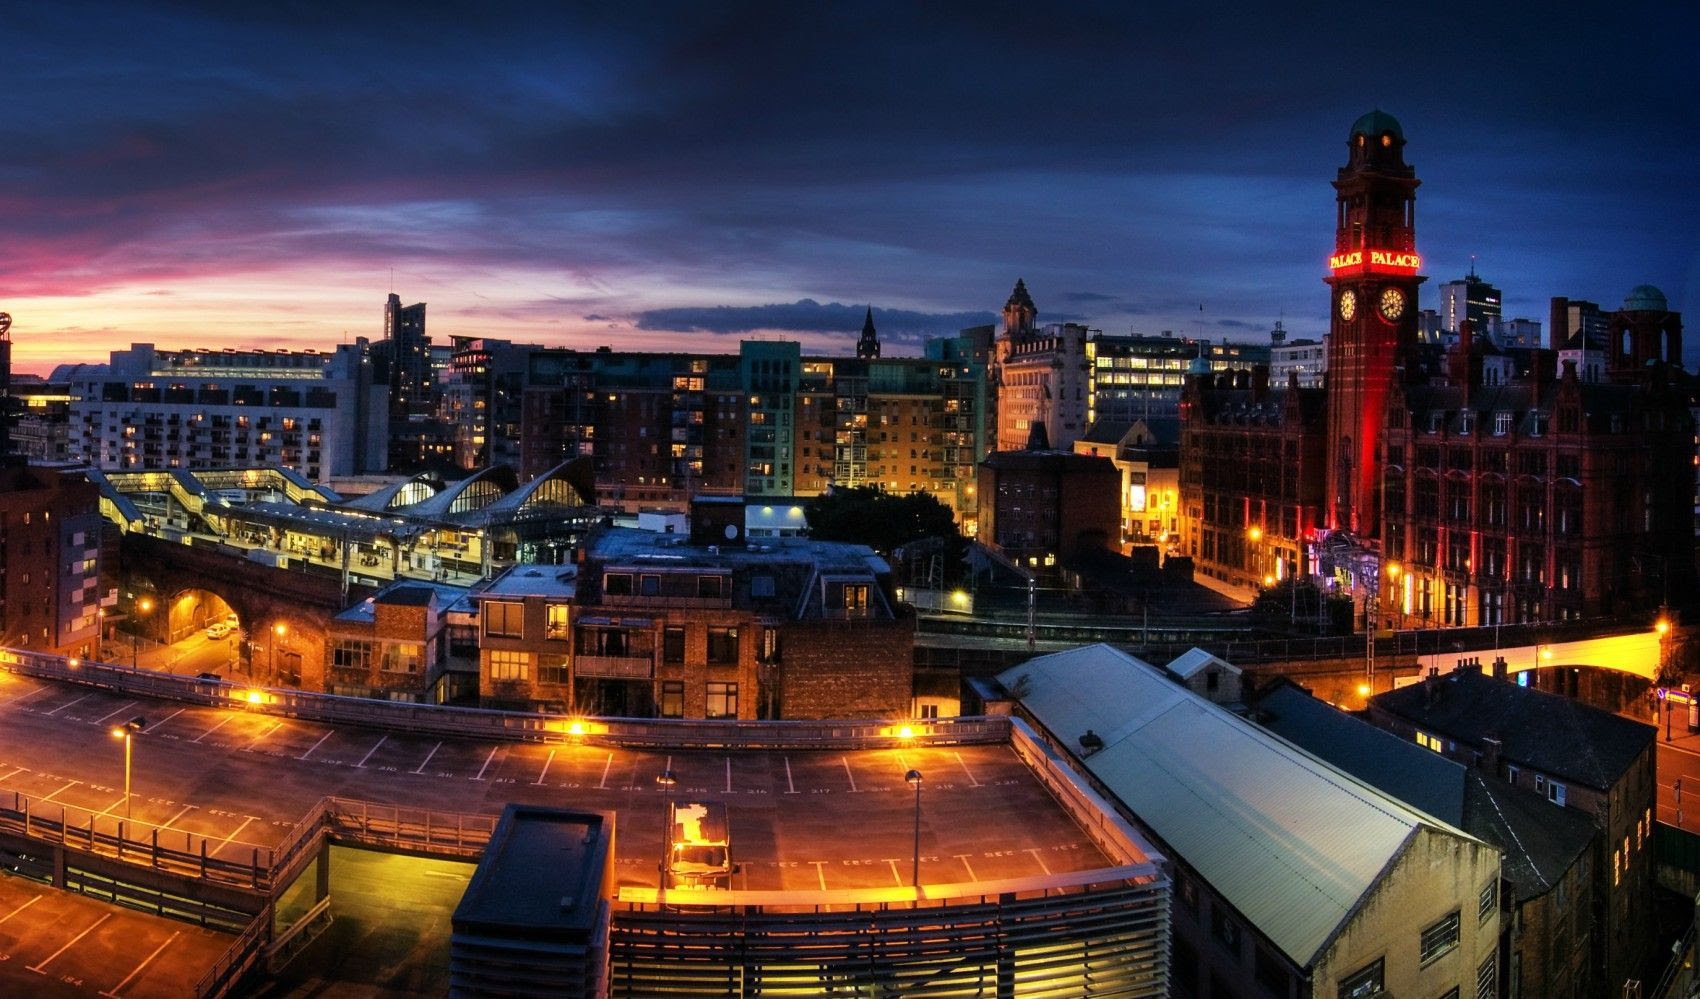 photo ManchesterCropped-1700x999_zpsd03d9075.jpg